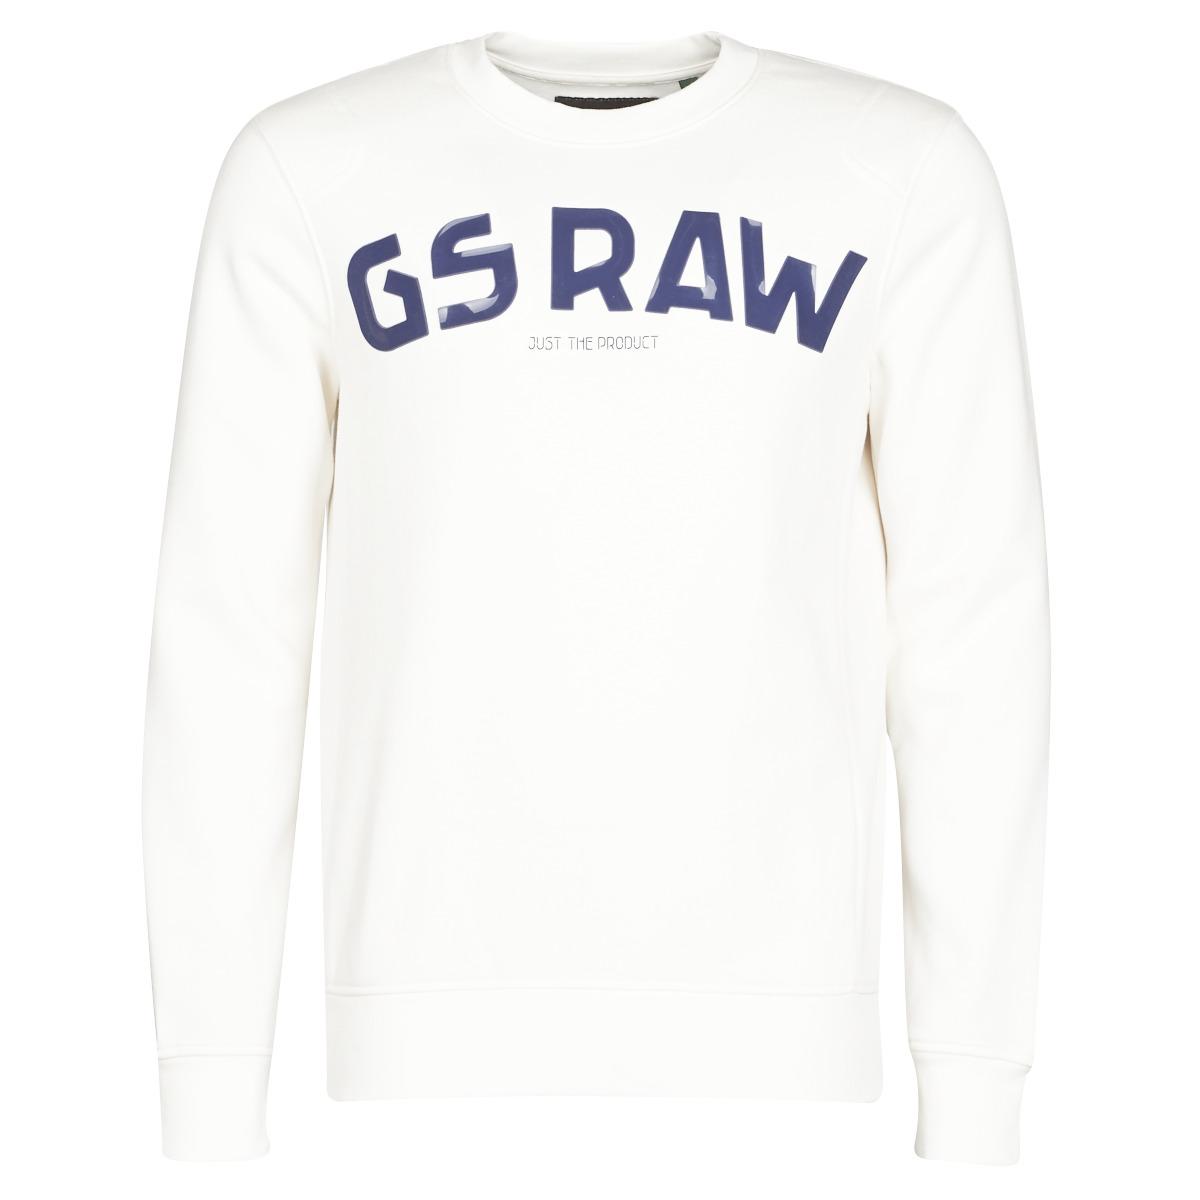 G-STAR RAW Sp10576 LS Tee Maglietta a Manica Lunga Bambina